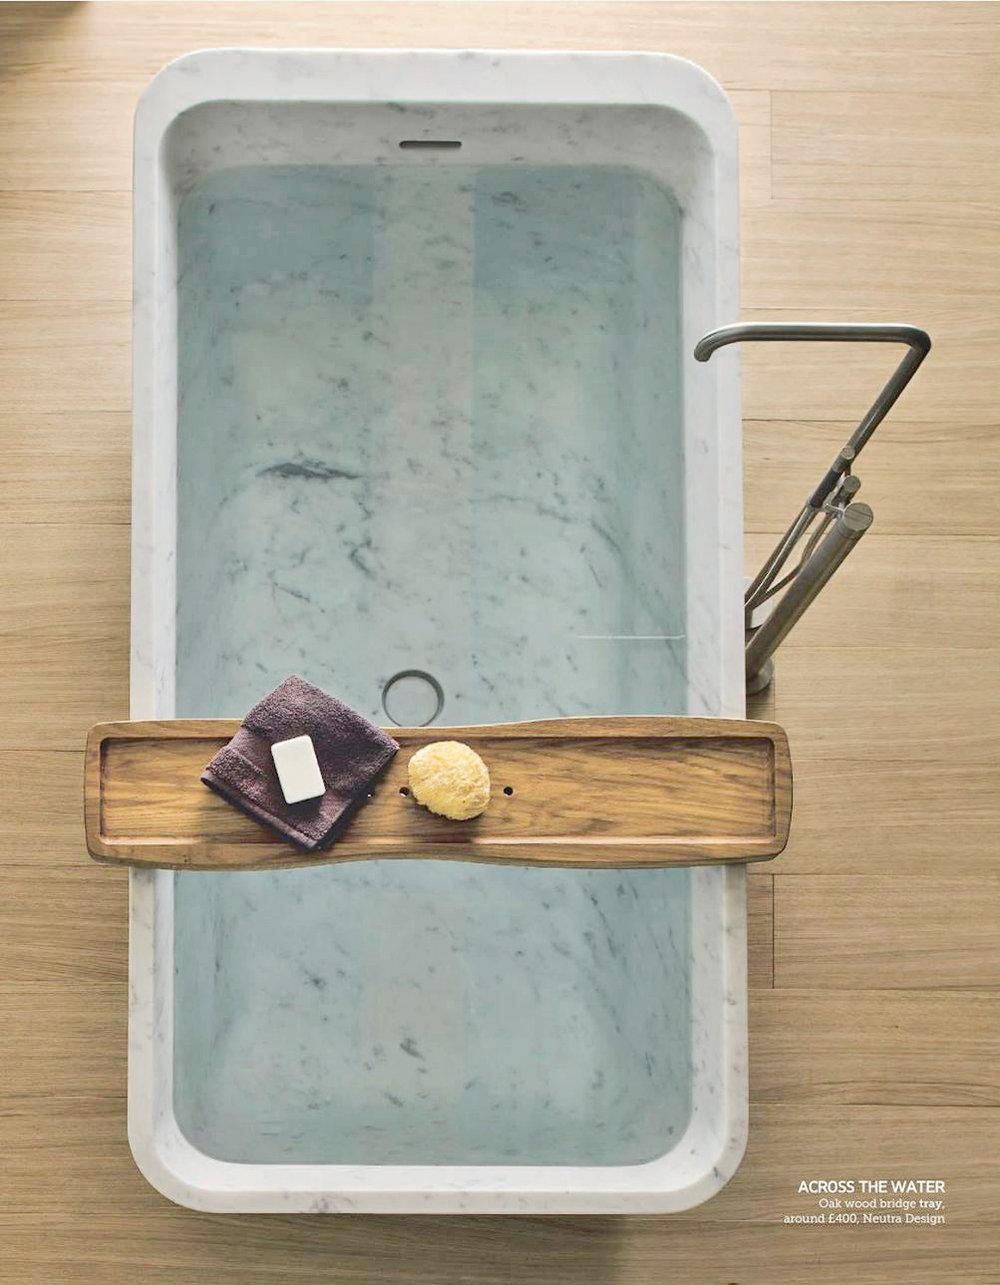 Duo Bathtub with Bridge Tray  - Inquire